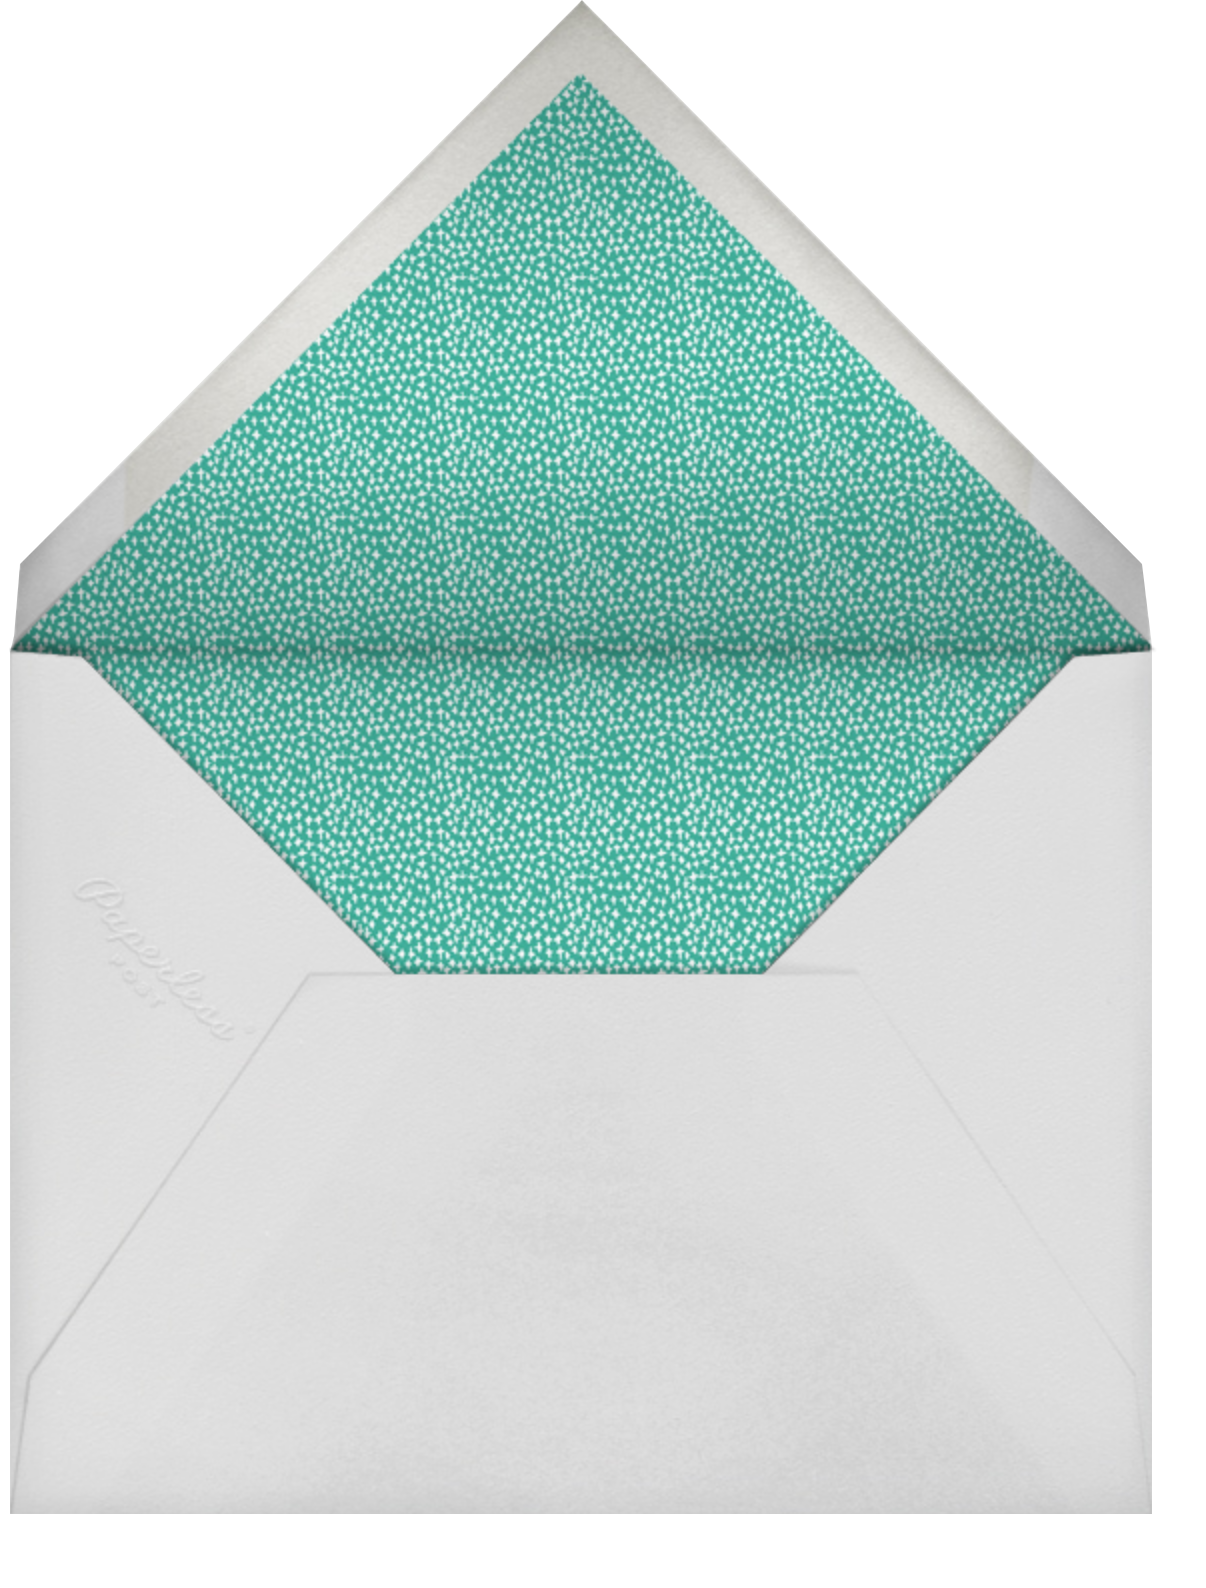 Miss Ivy (Invitation) - Mr. Boddington's Studio - All - envelope back